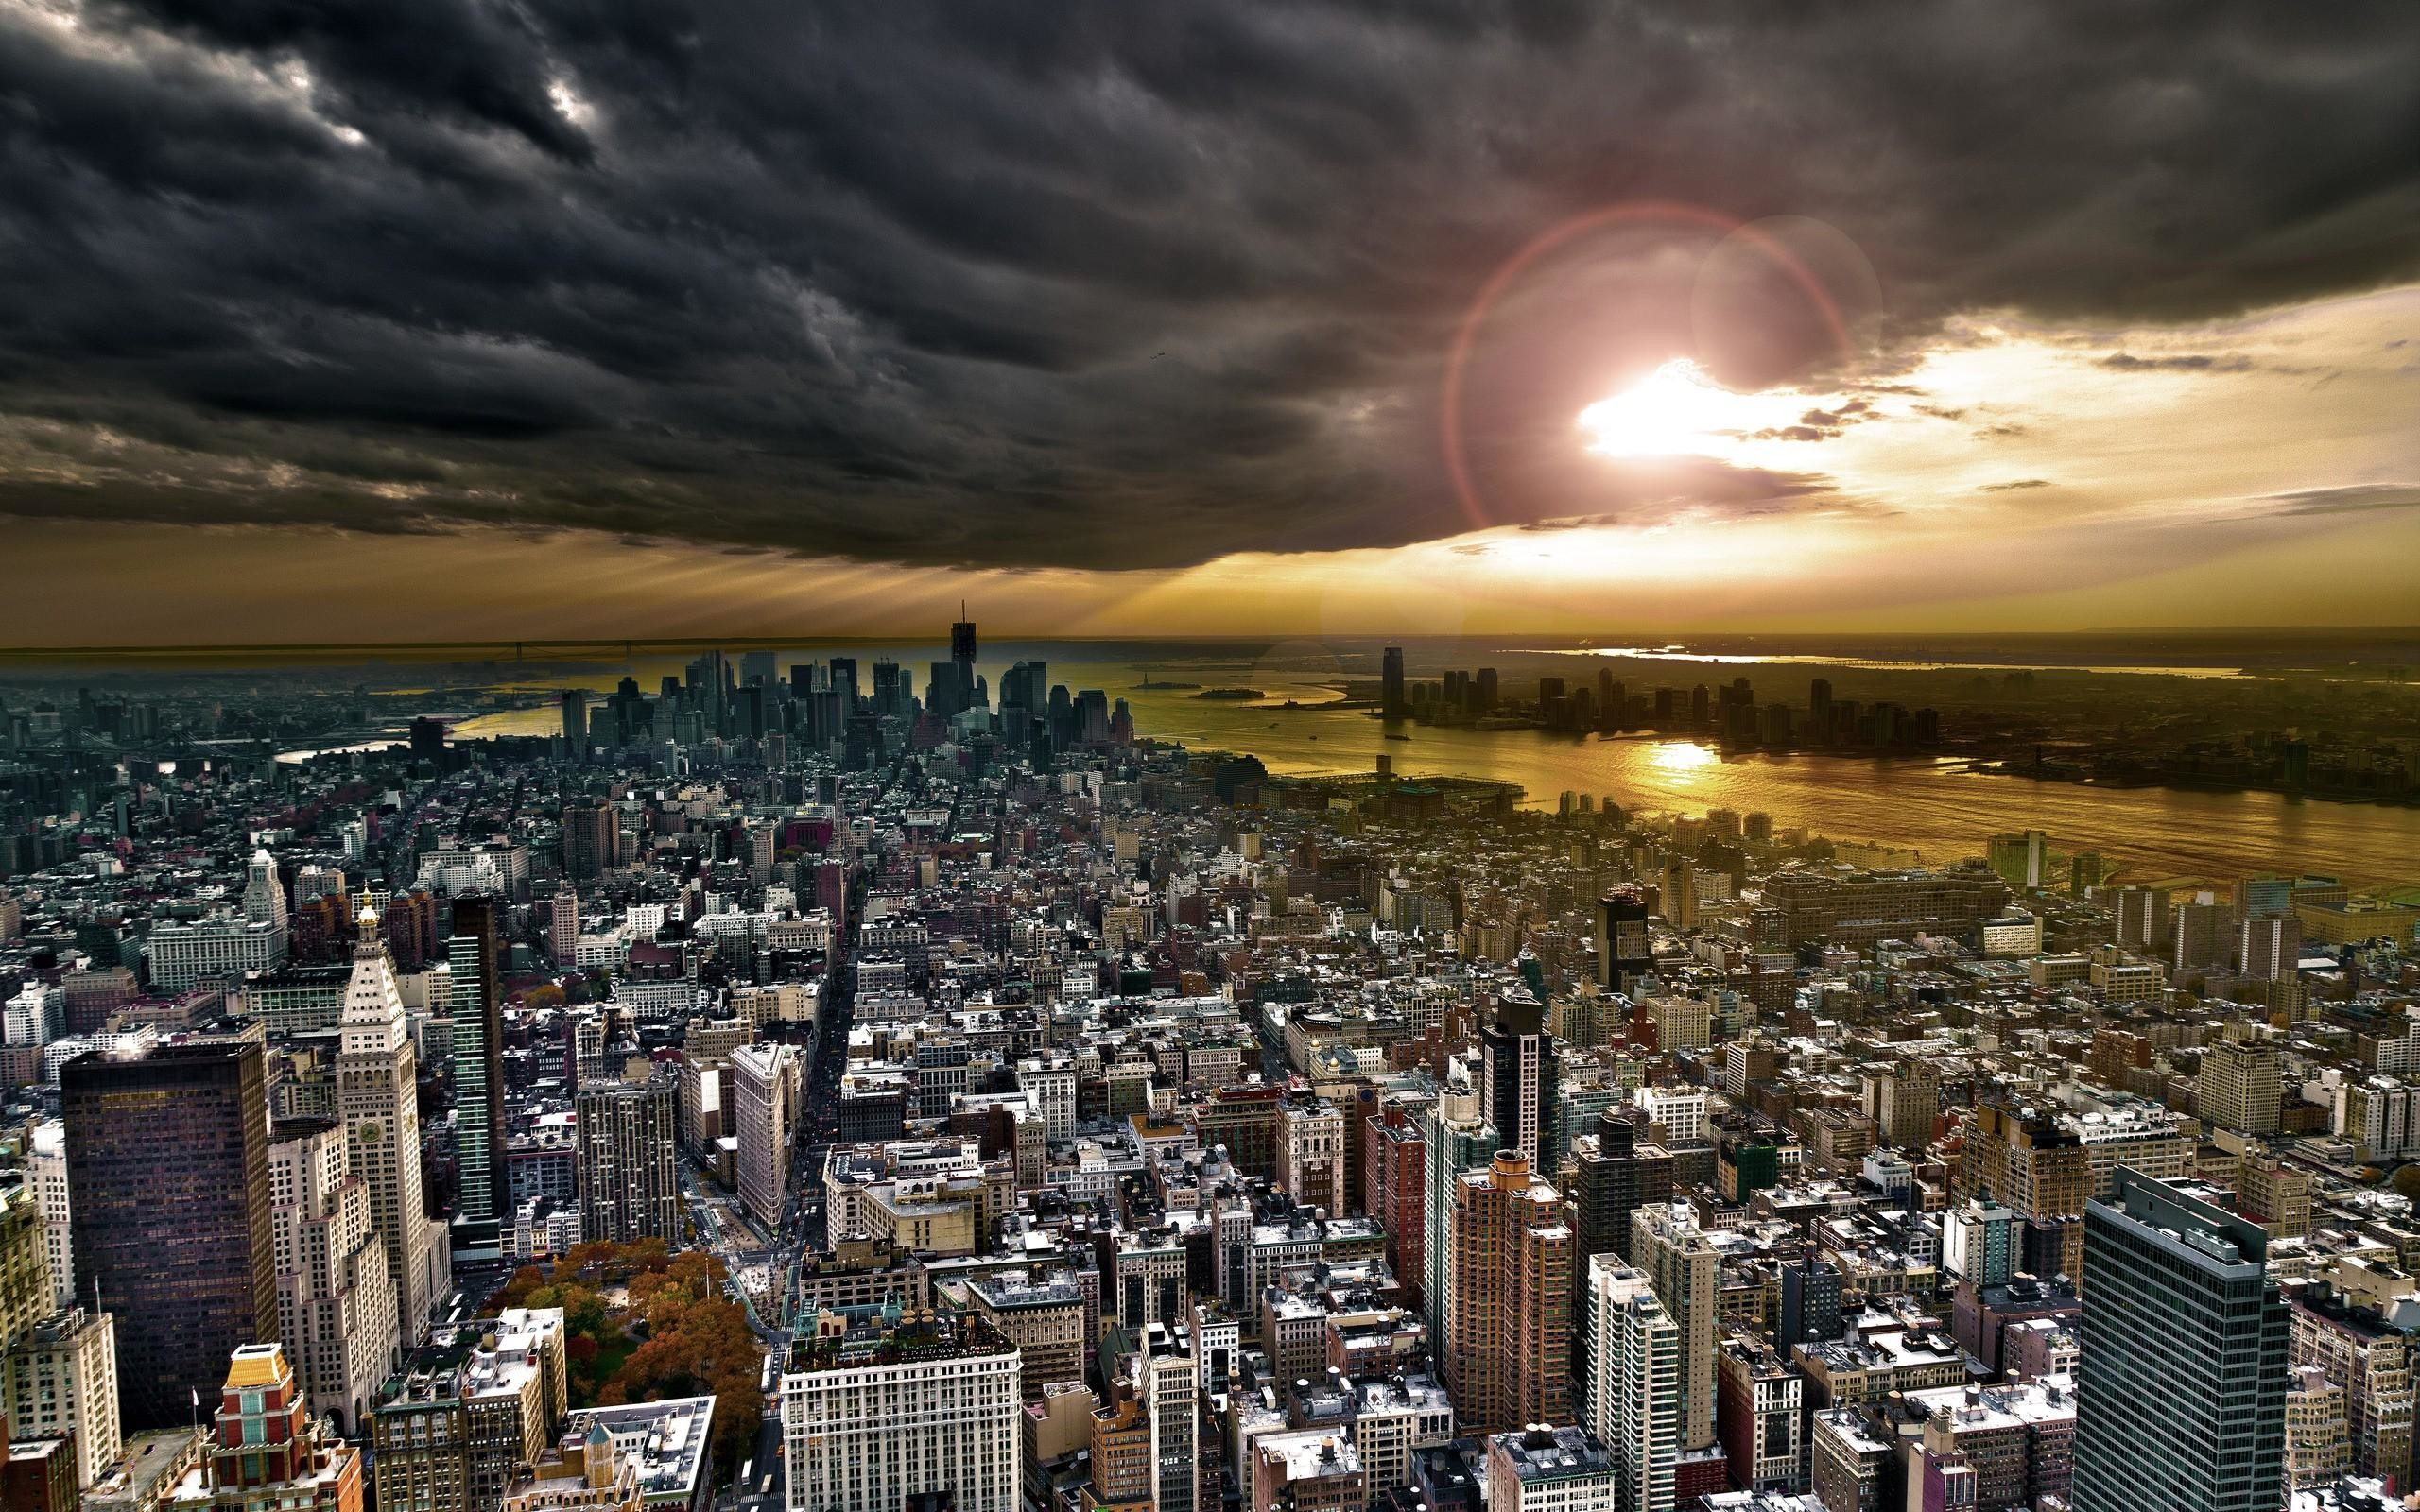 New York City Skyline Wallpaper 4K | Wide Screen Wallpaper 1080p,2K,4K